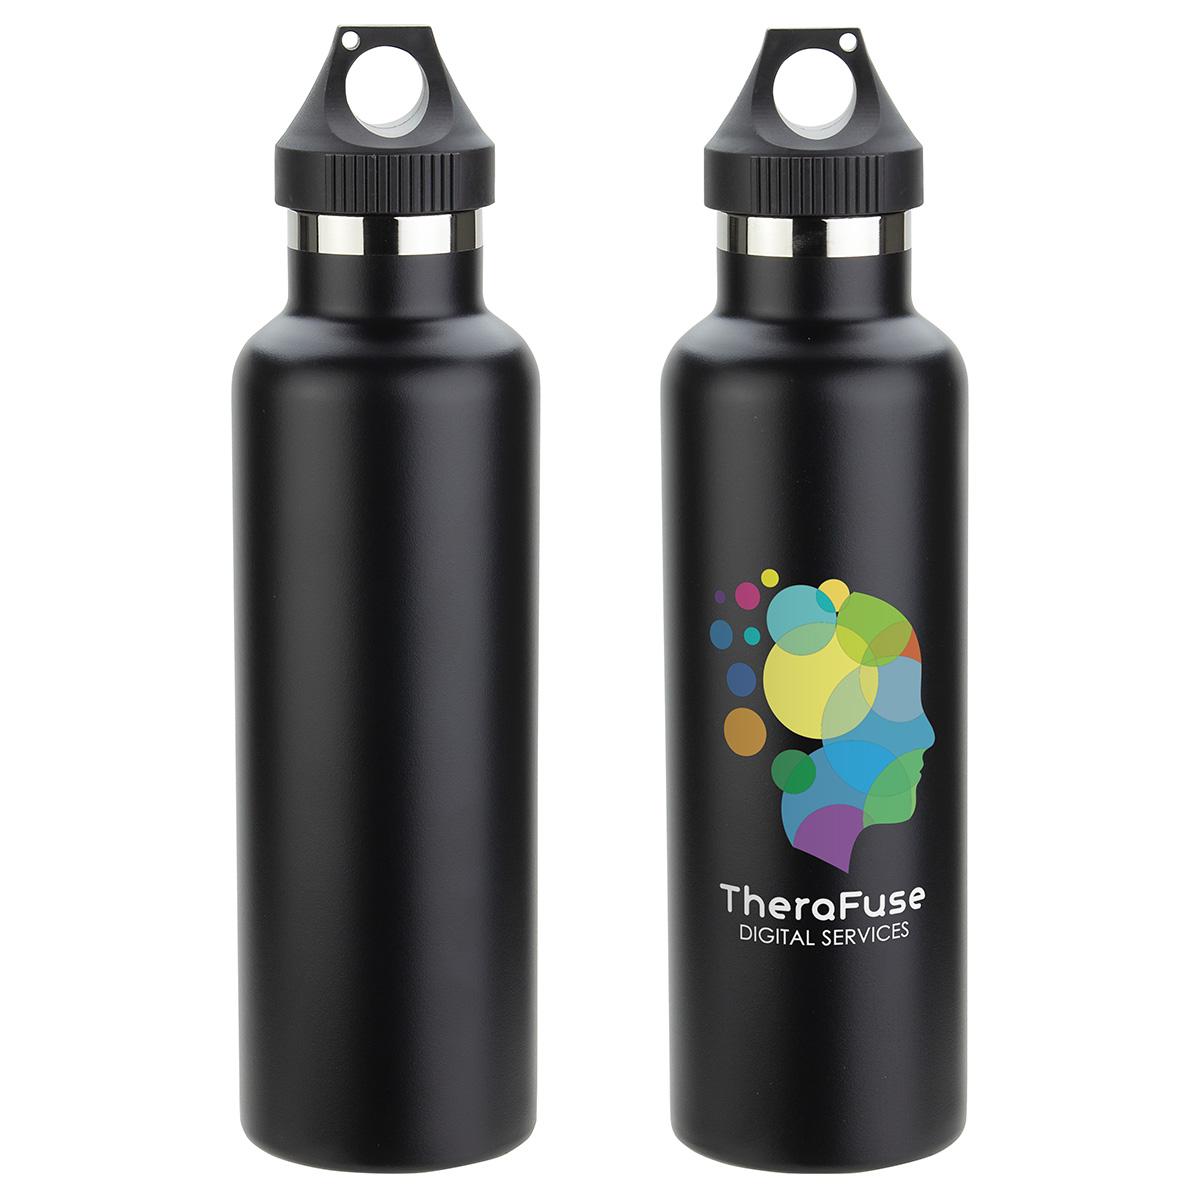 Peak 25oz Vacuum Insulated Stainless Steel Bottle, DBT-PK17 - 1 Colour Imprint